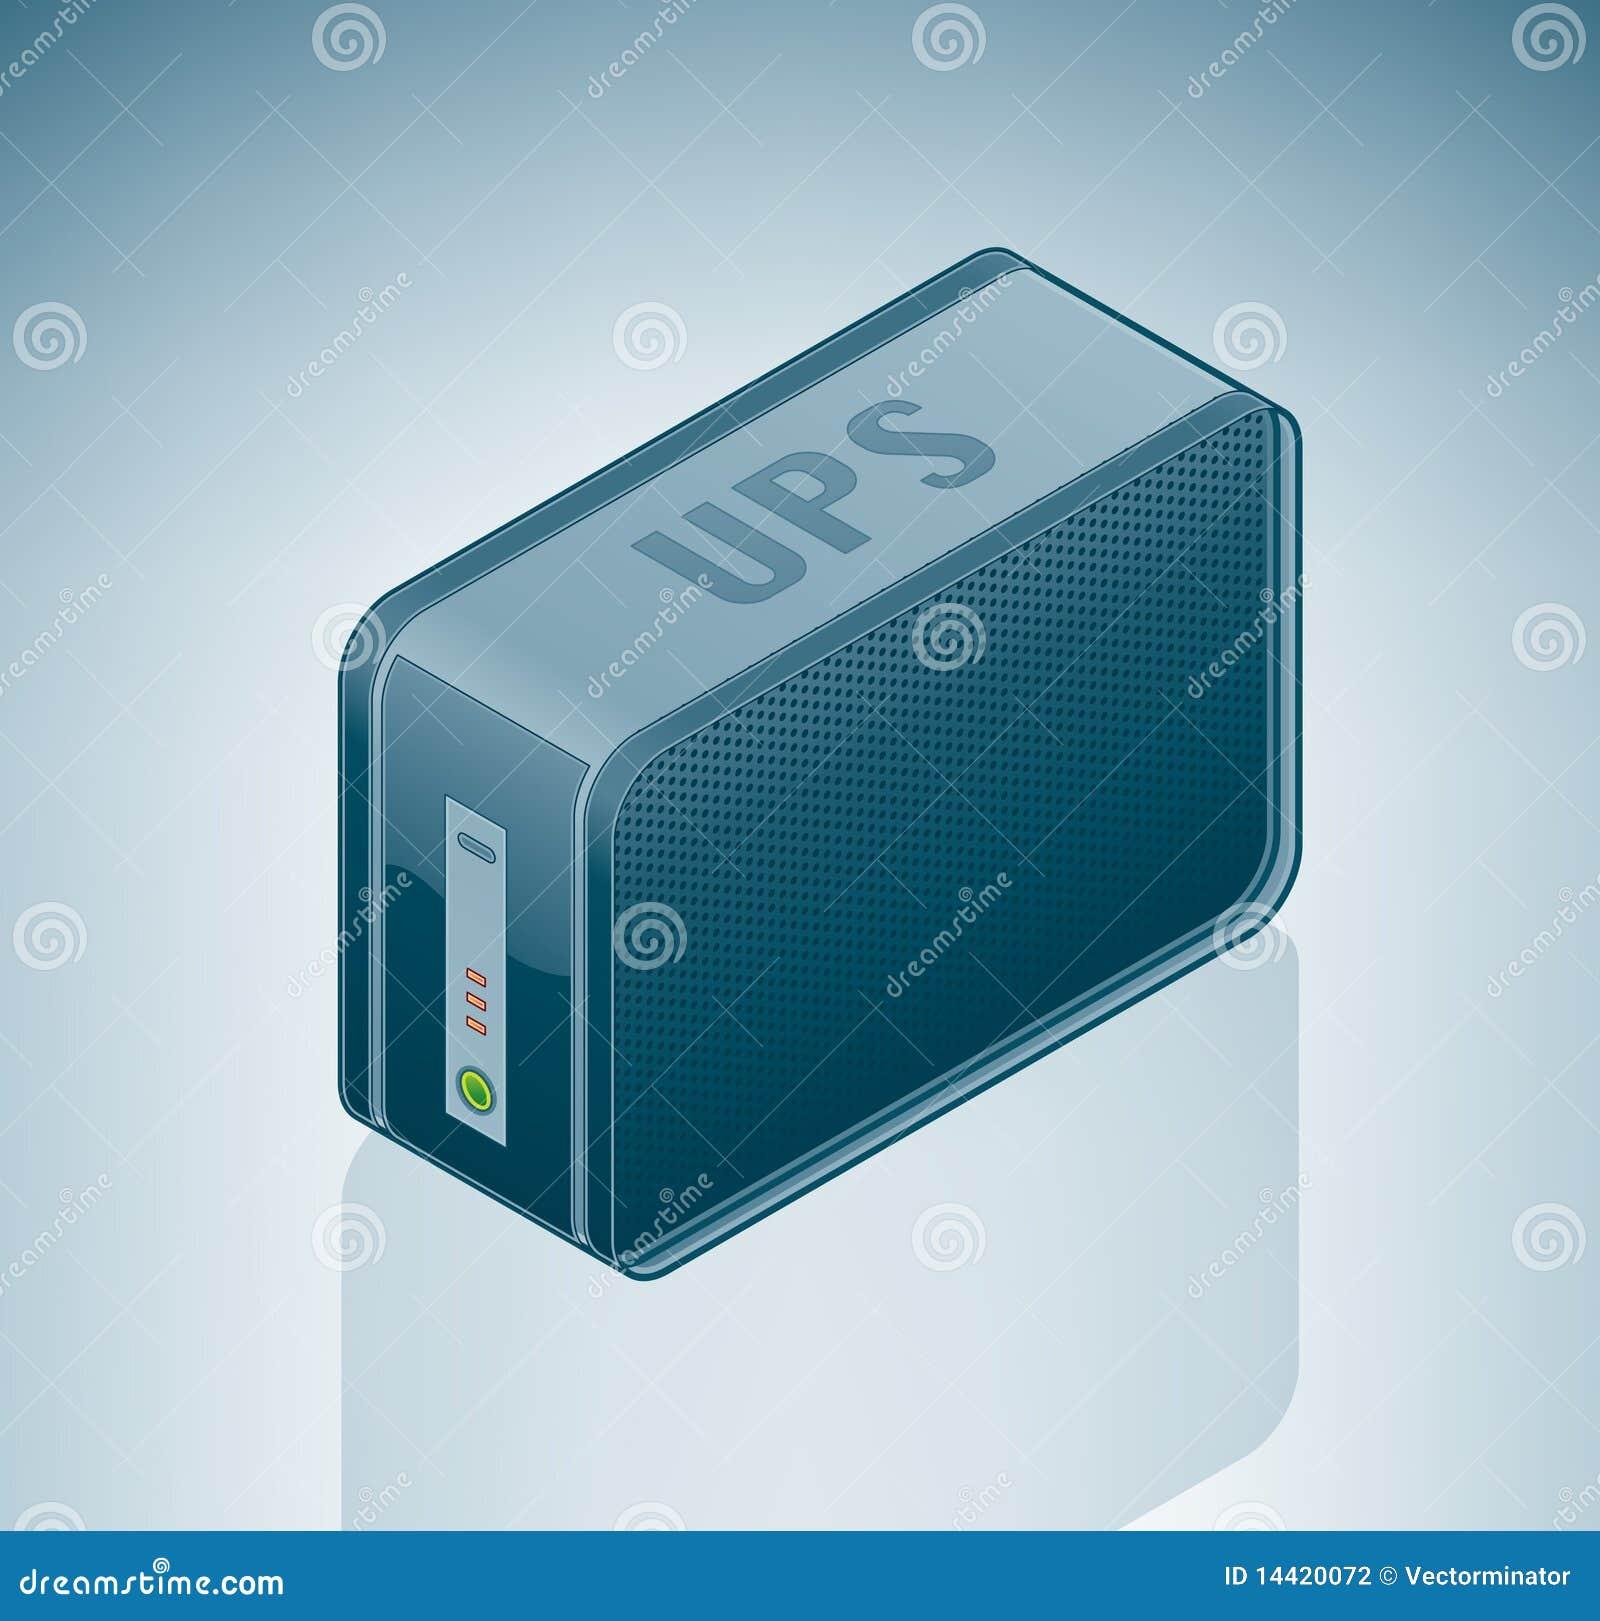 Ups Uninterruptible Power Supply Stock Vector Illustration Of